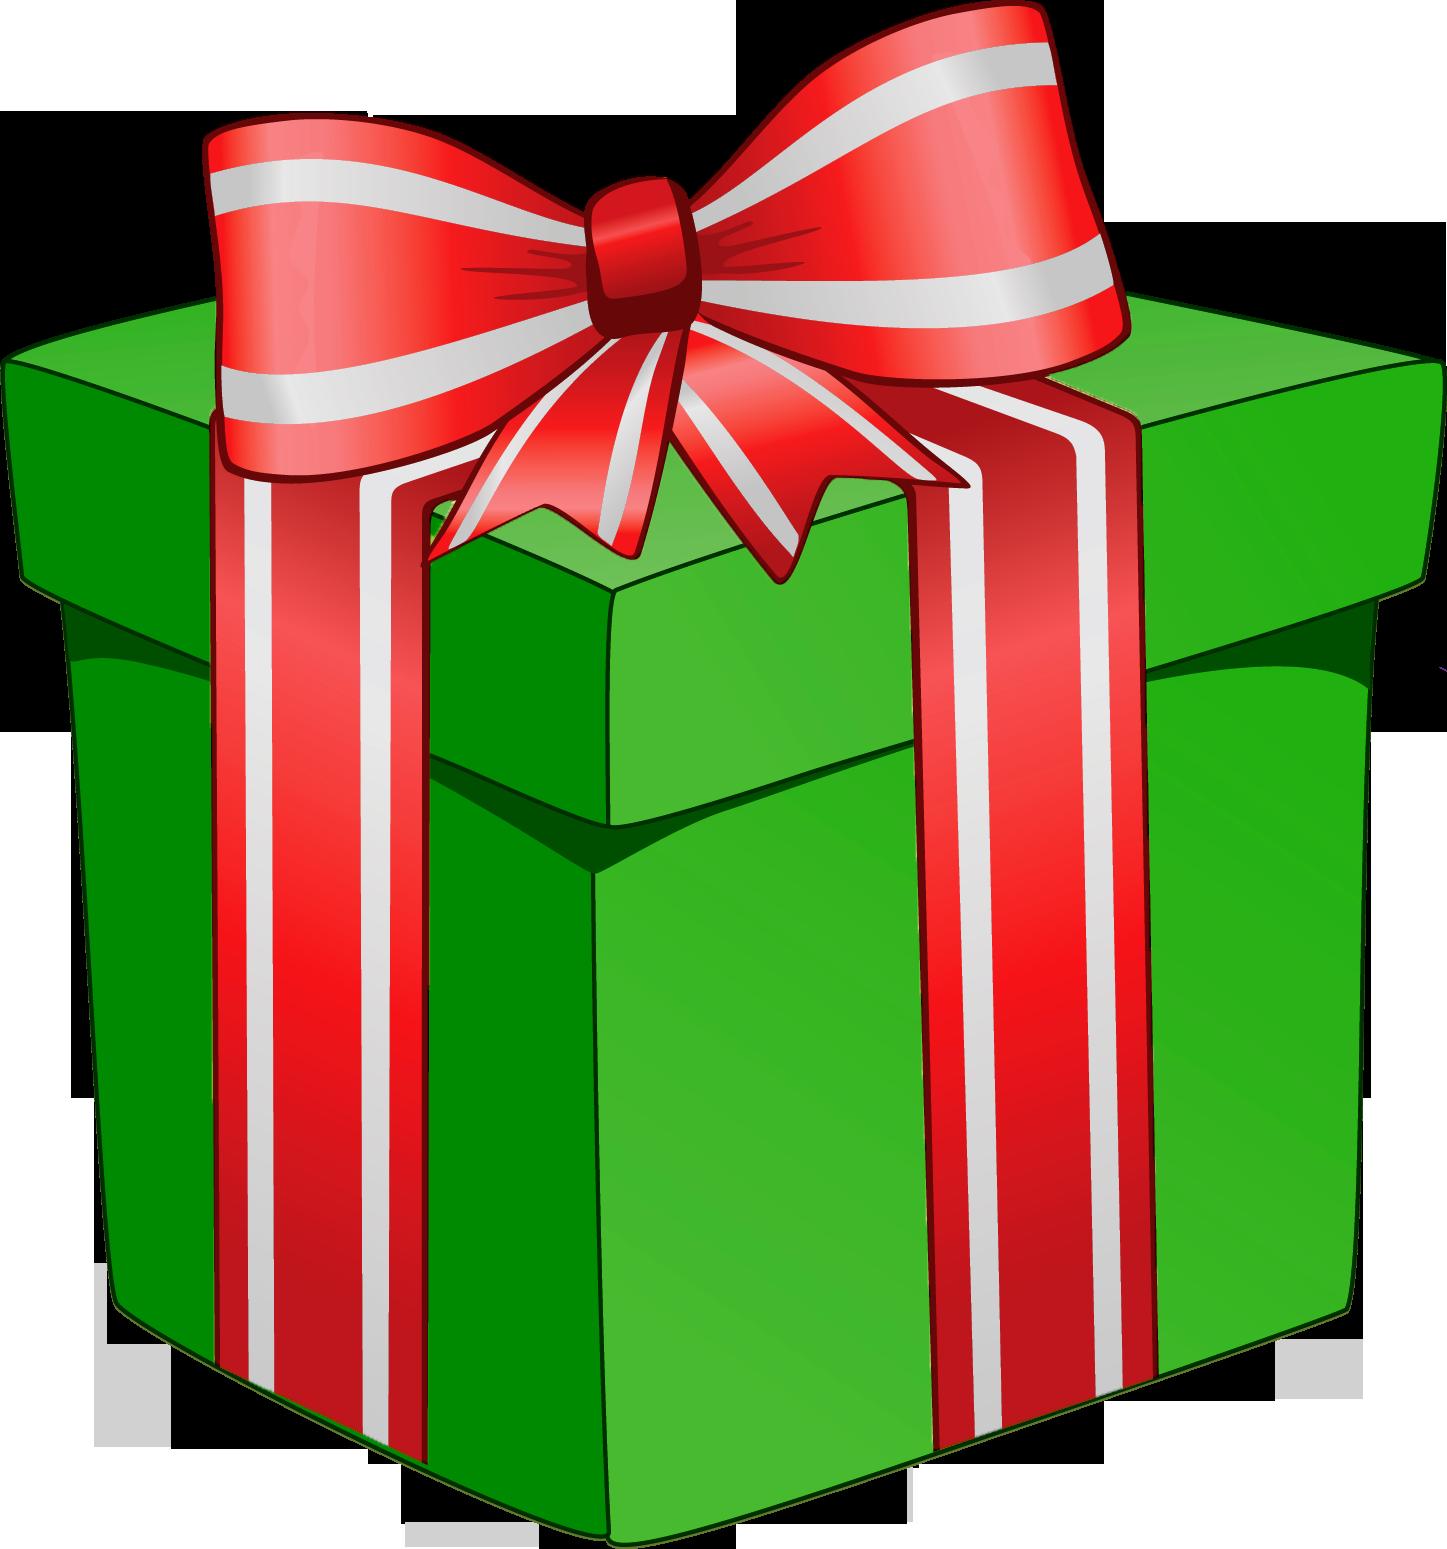 Xmas Stuff For Christmas Gift Boxes Clip-Xmas Stuff For Christmas Gift Boxes Clip Art-19